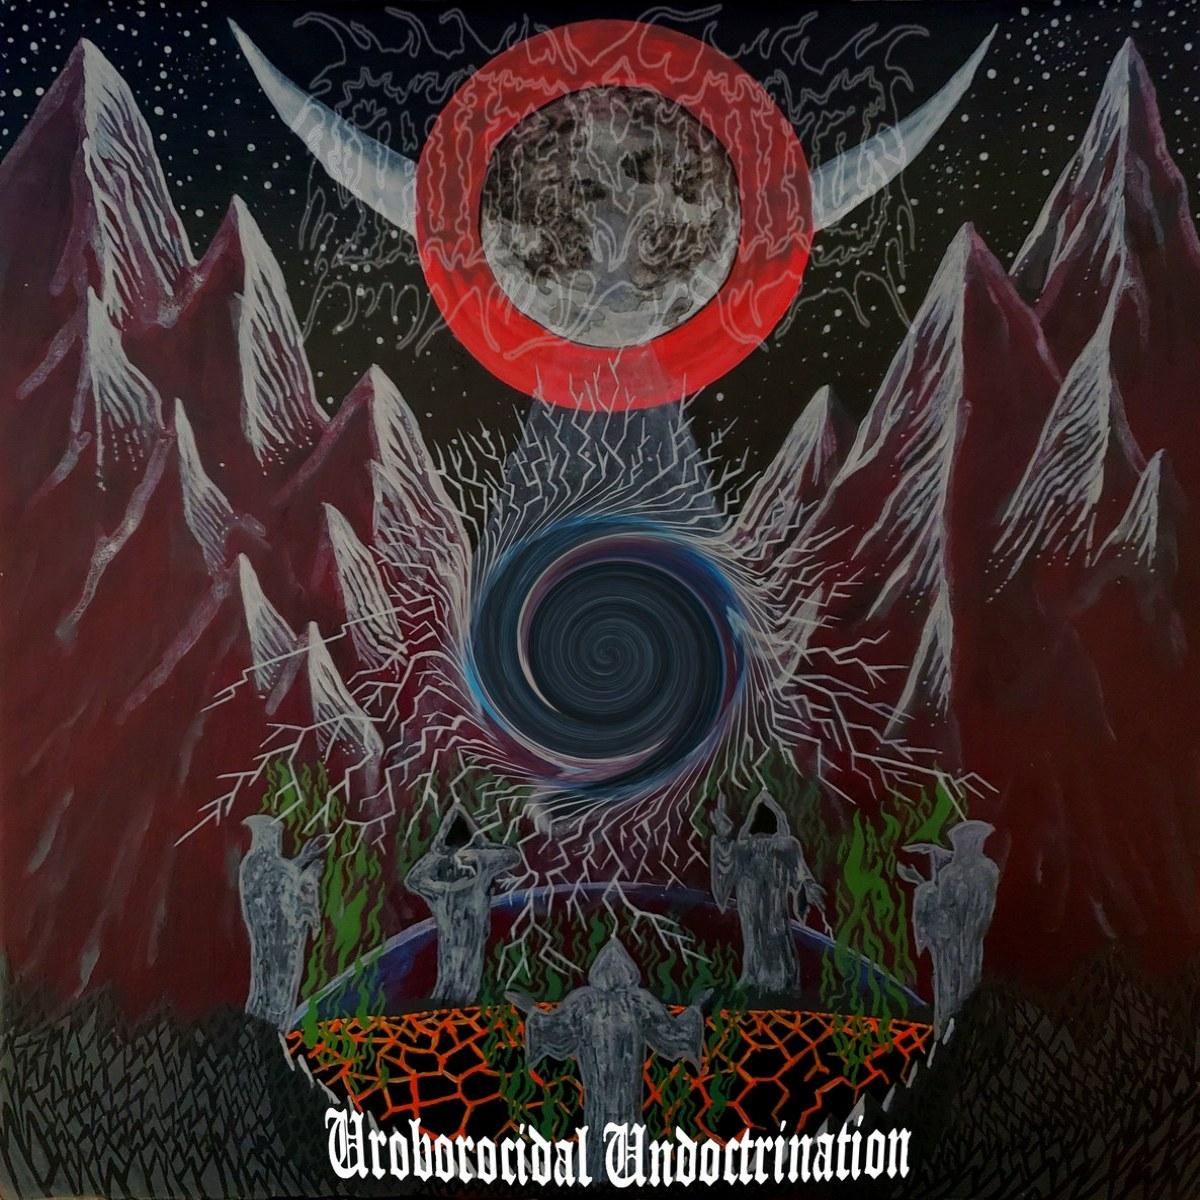 Reviews for Miasmic - Uroborocidal Undoctrination